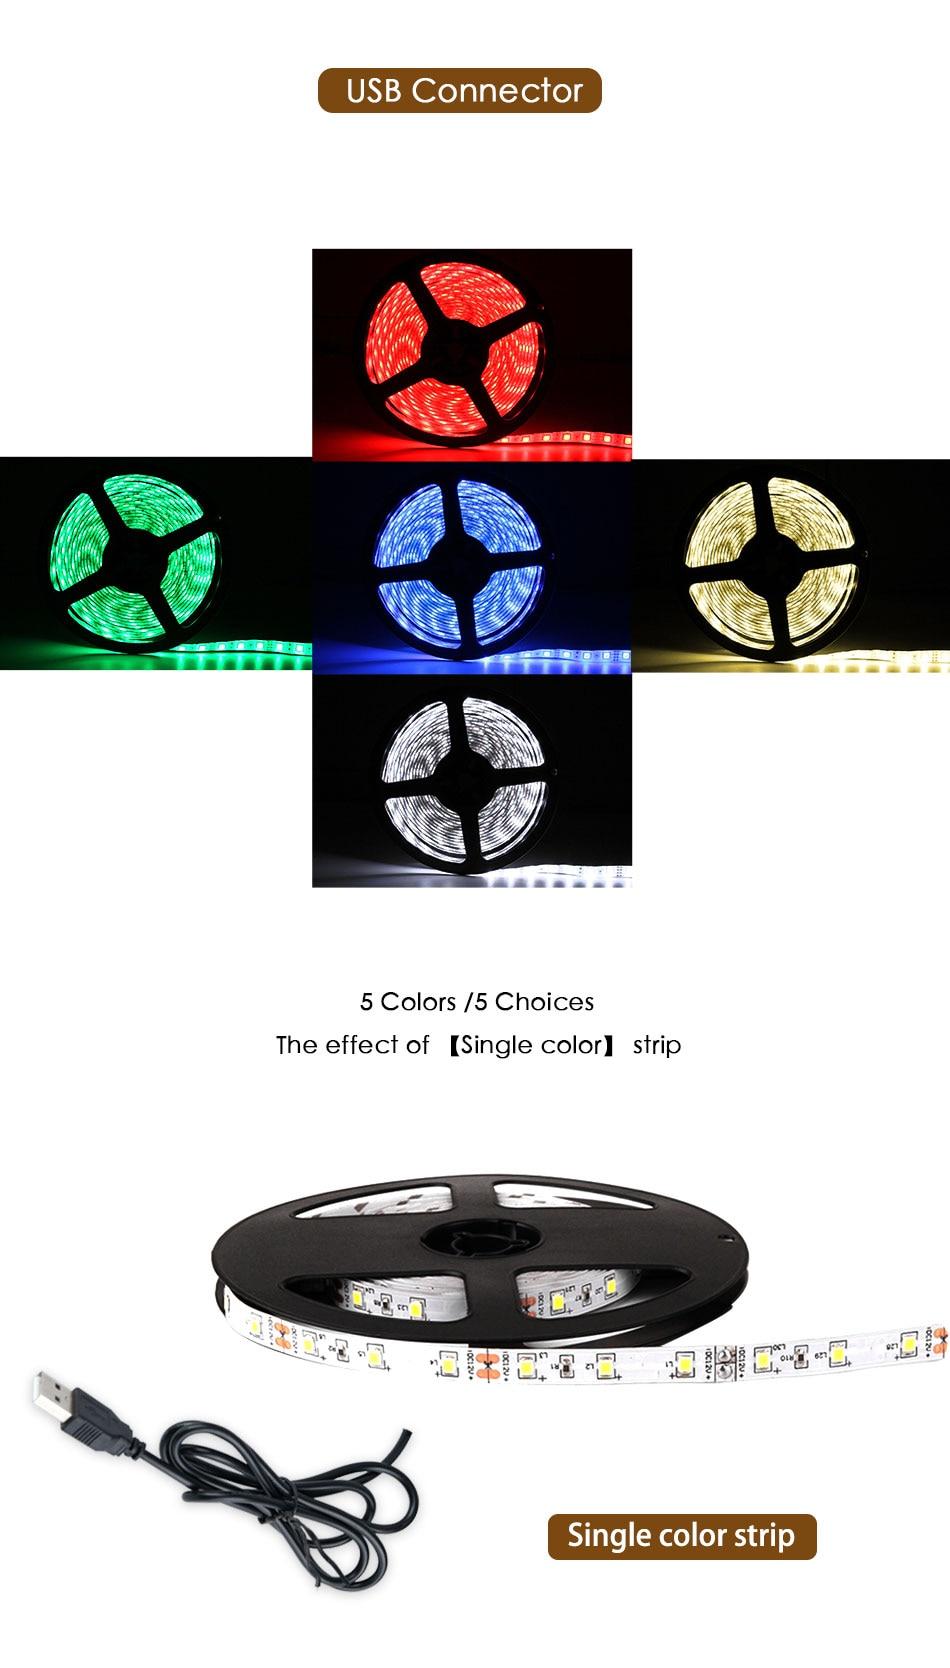 HTB1pFIATzDpK1RjSZFrq6y78VXaj DC 5V LED Strip 3Key USB Cable Power Flexible Light Lamp 50CM 1M 2M 3M 4M 5M SMD 2835 Desk Screen Tape TV Background Lighting